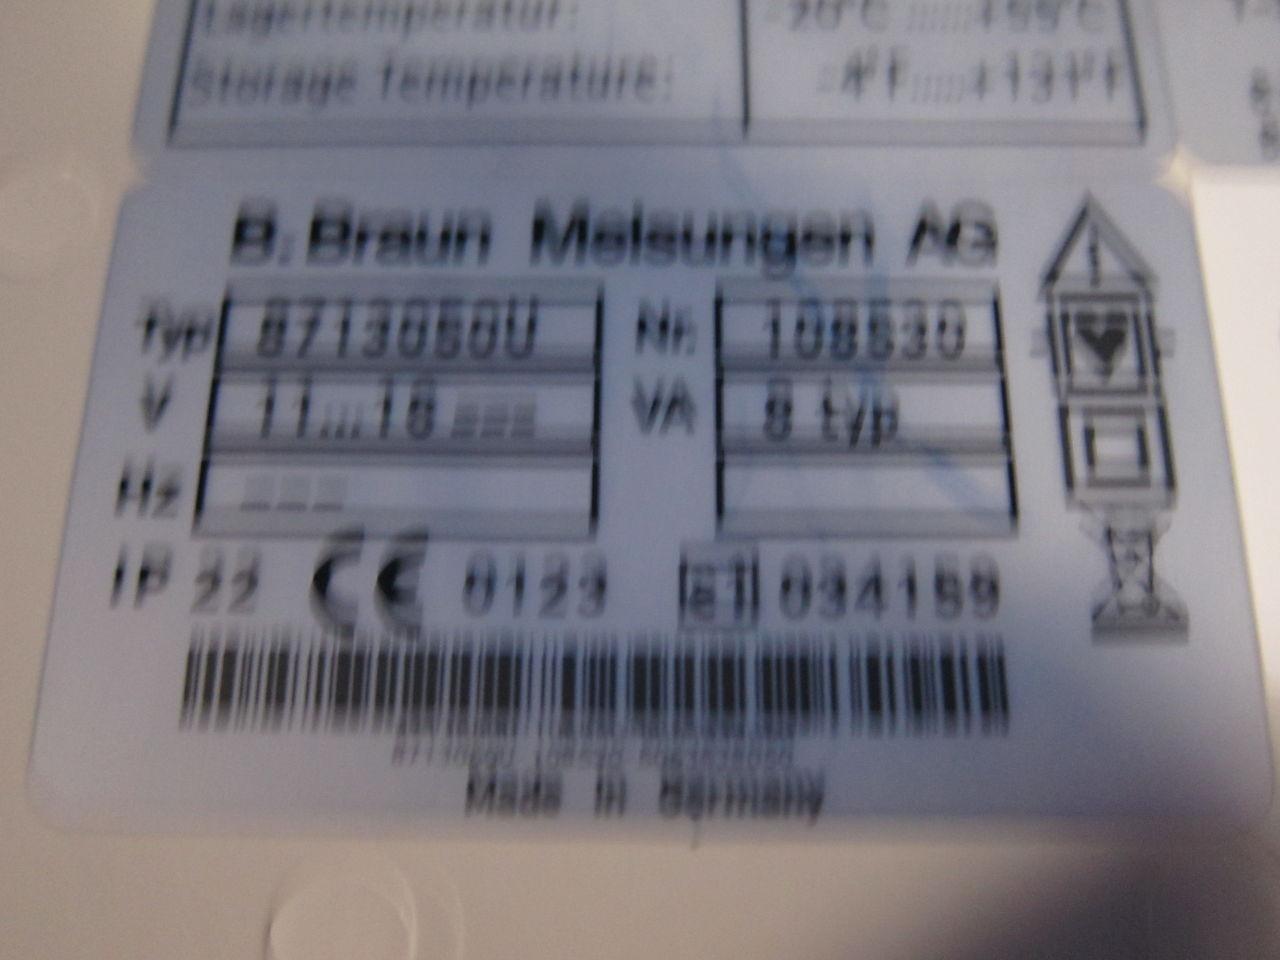 BRAUN 8713050U  - Lot of 3 Pump IV Infusion